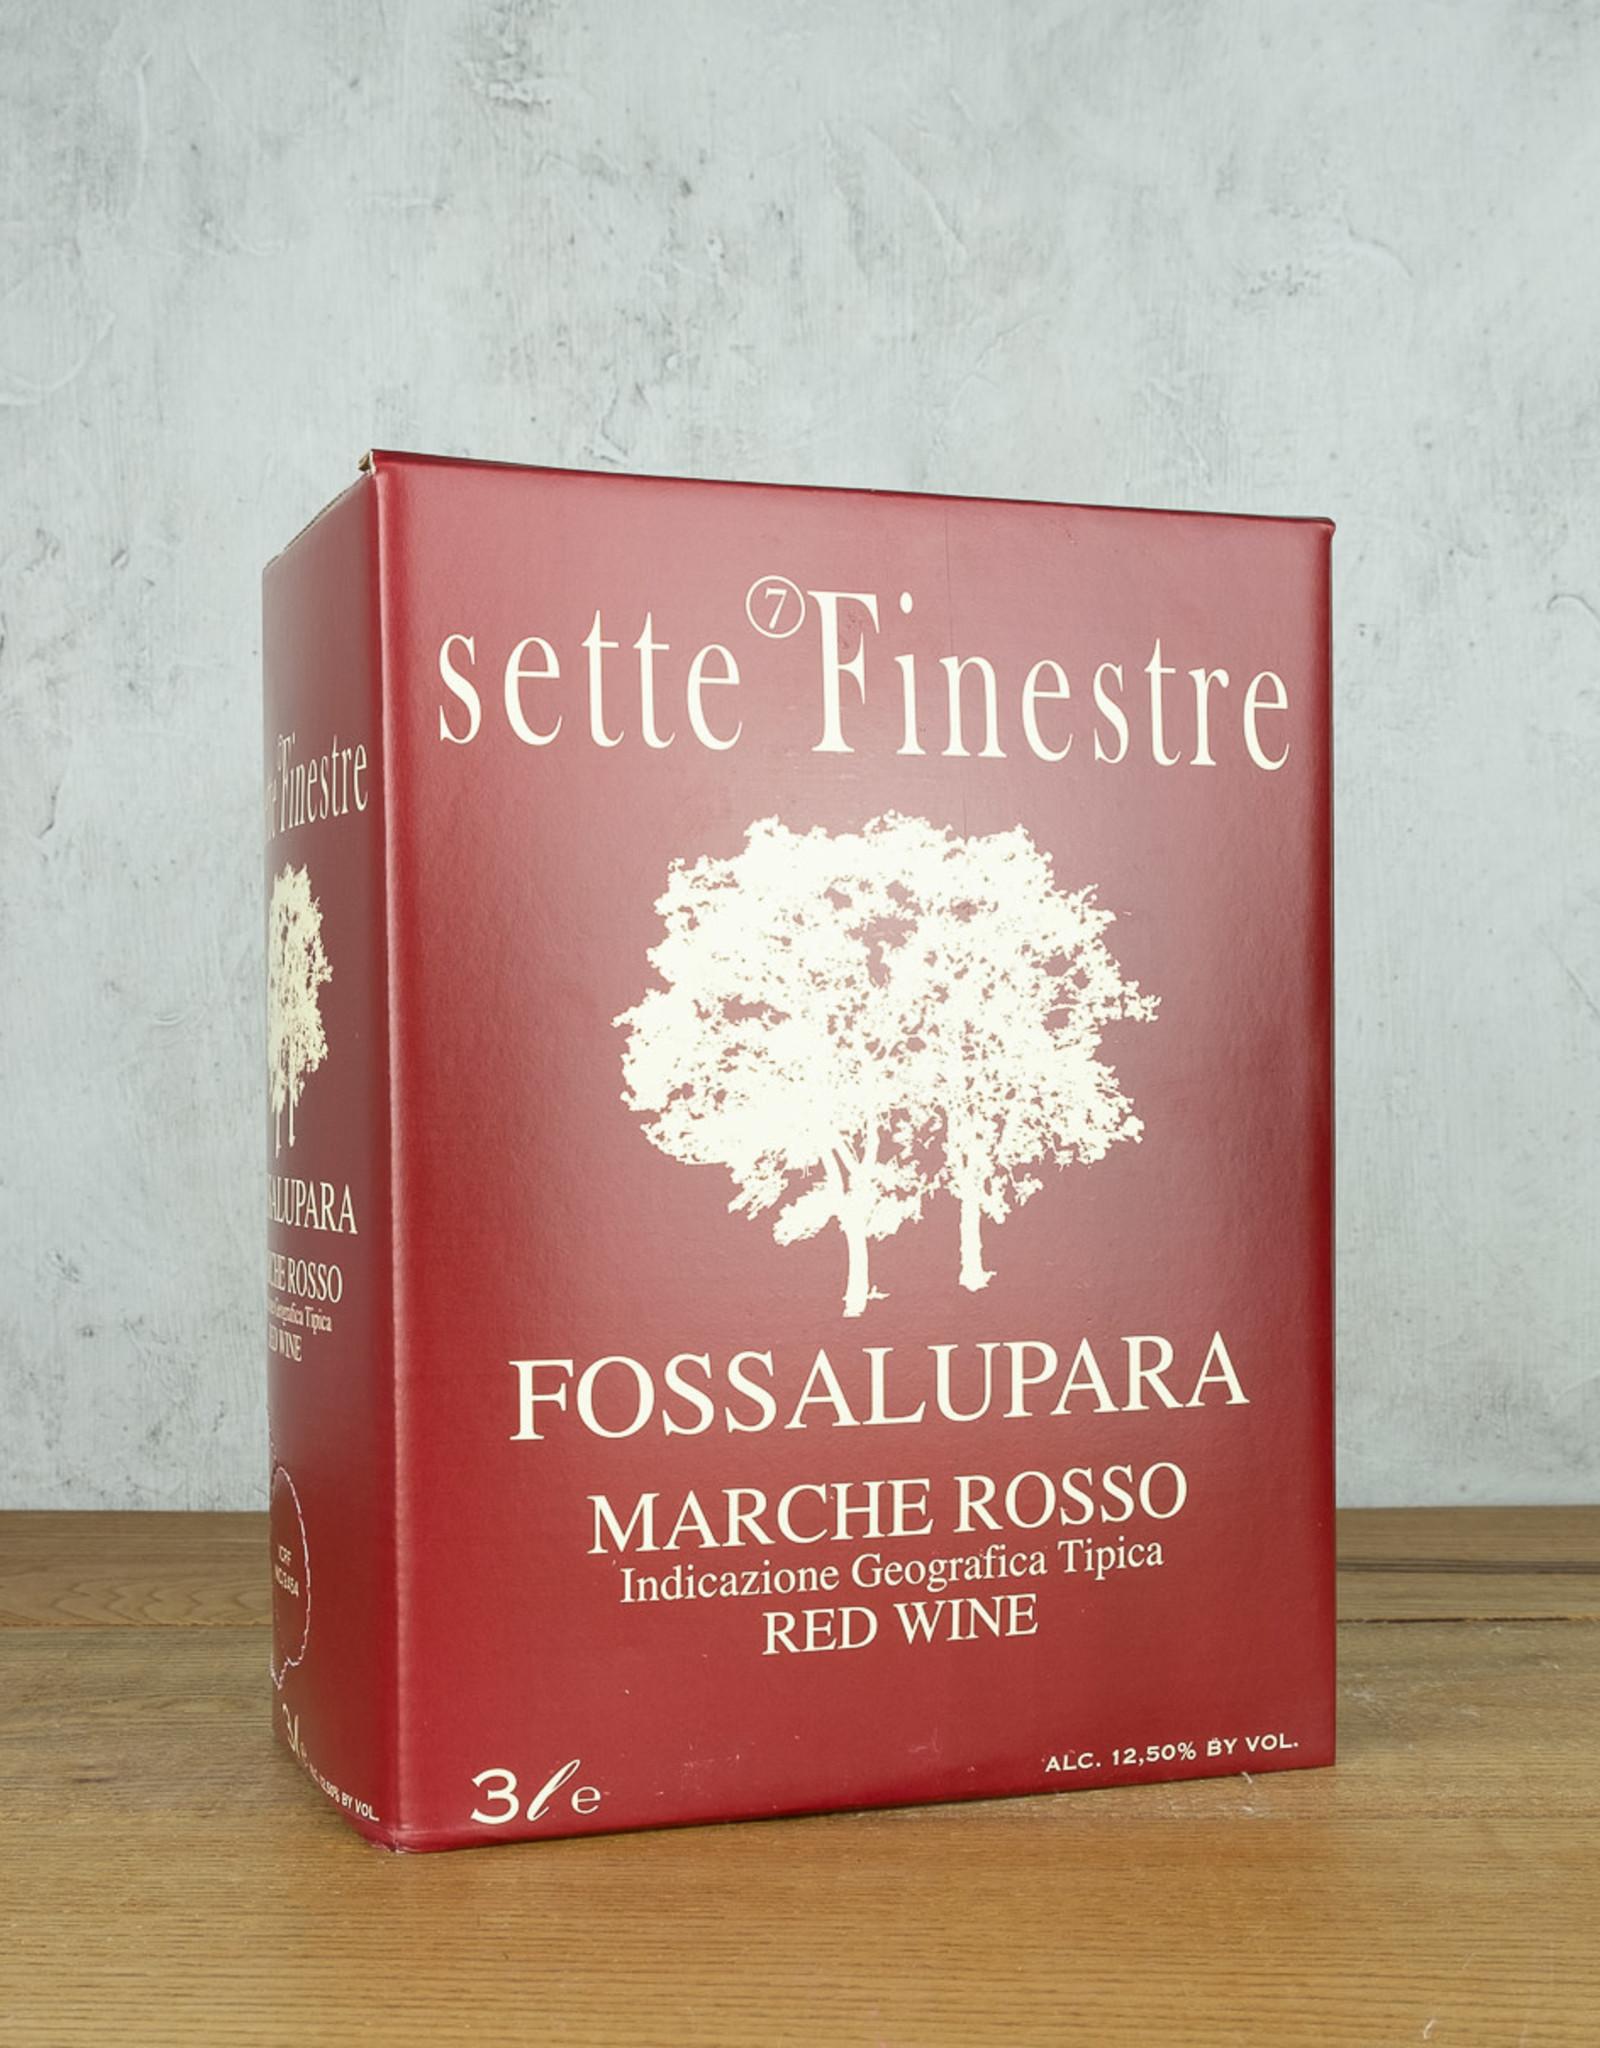 Sette Finestre Fossalupara 3L Box